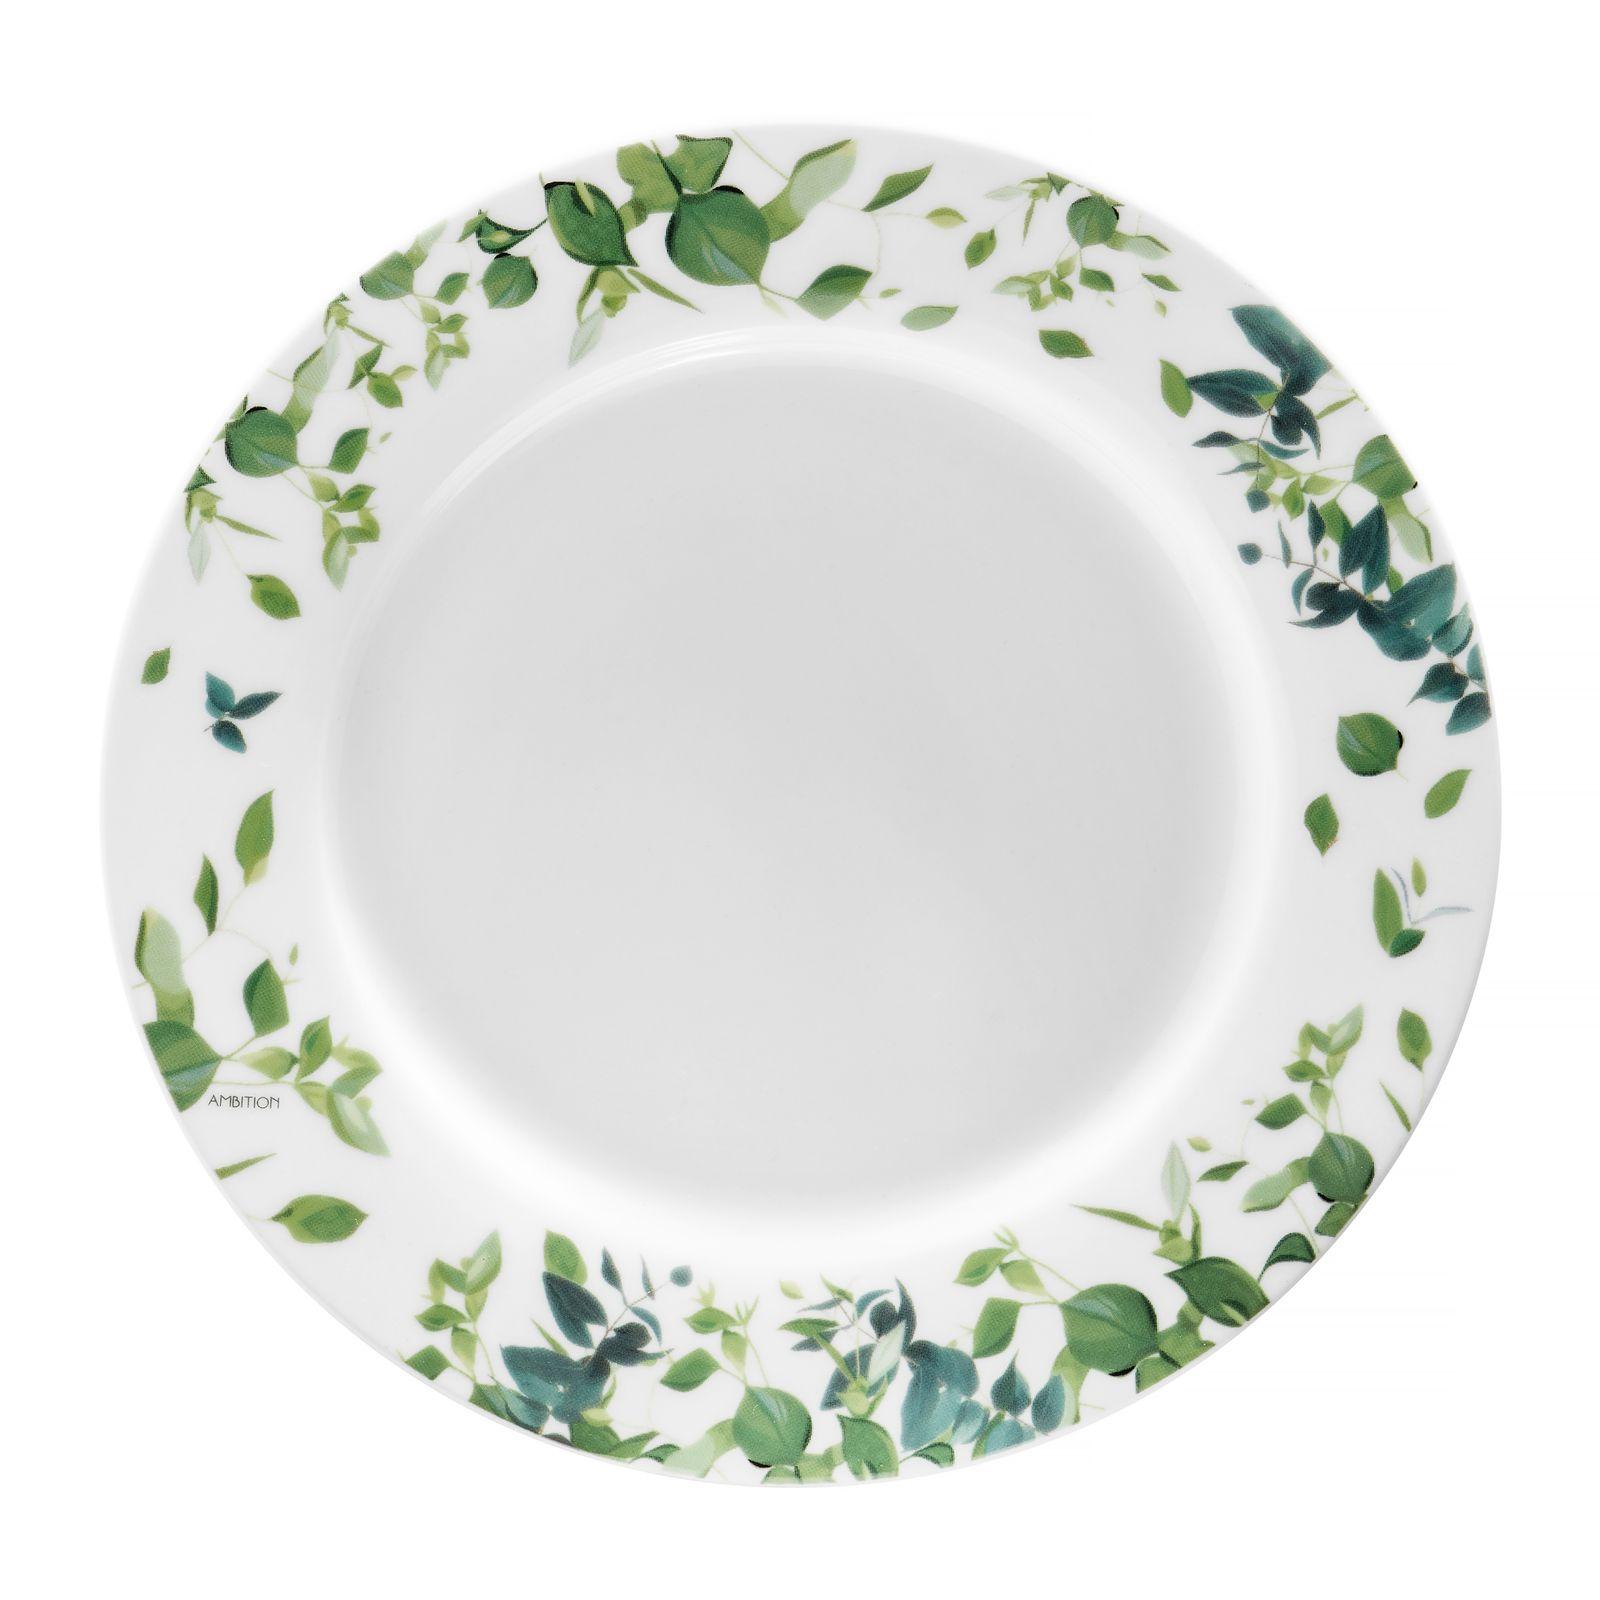 Plytký tanier Bizet 27 cm AMBITION